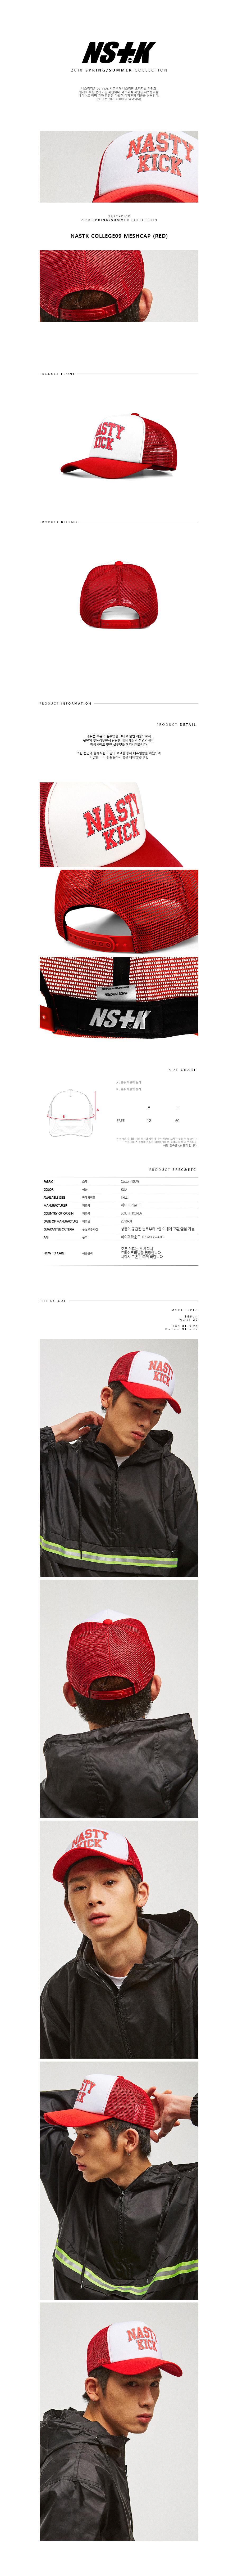 [NSTK] NASTK COLLEGE09 MESHCAP (RED).jpg